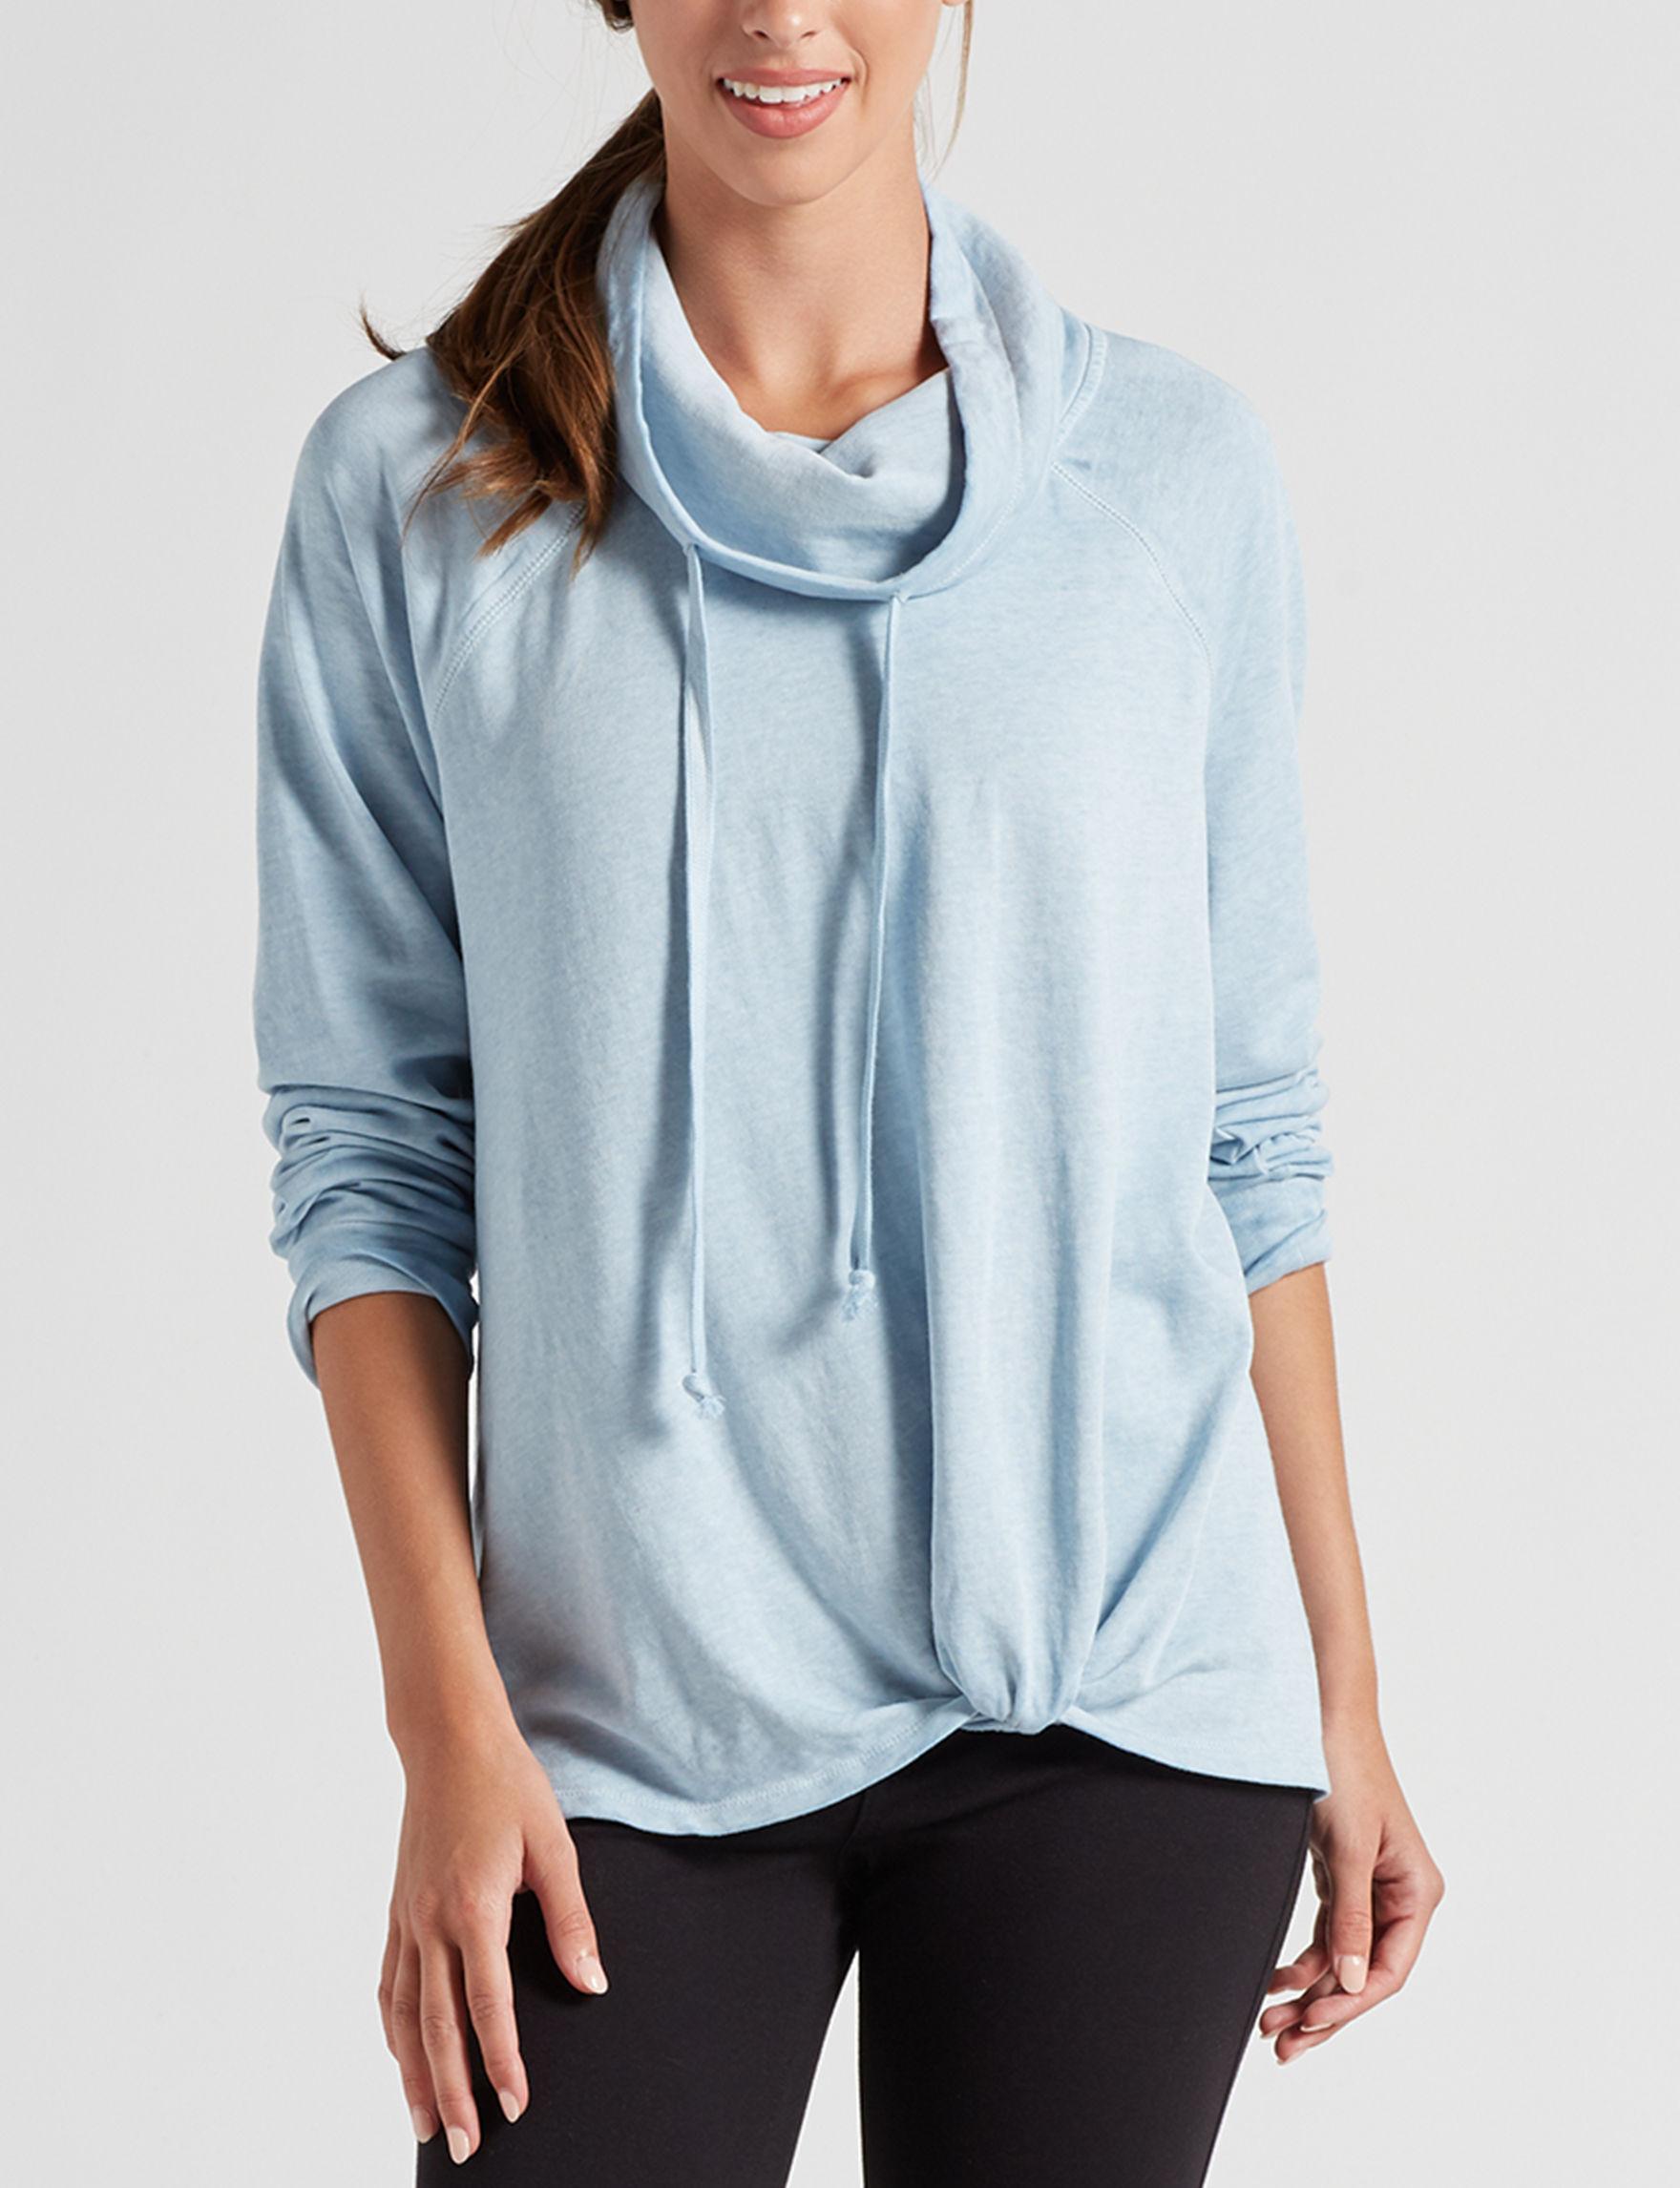 Signature Studio Light Blue Pull-overs Shirts & Blouses